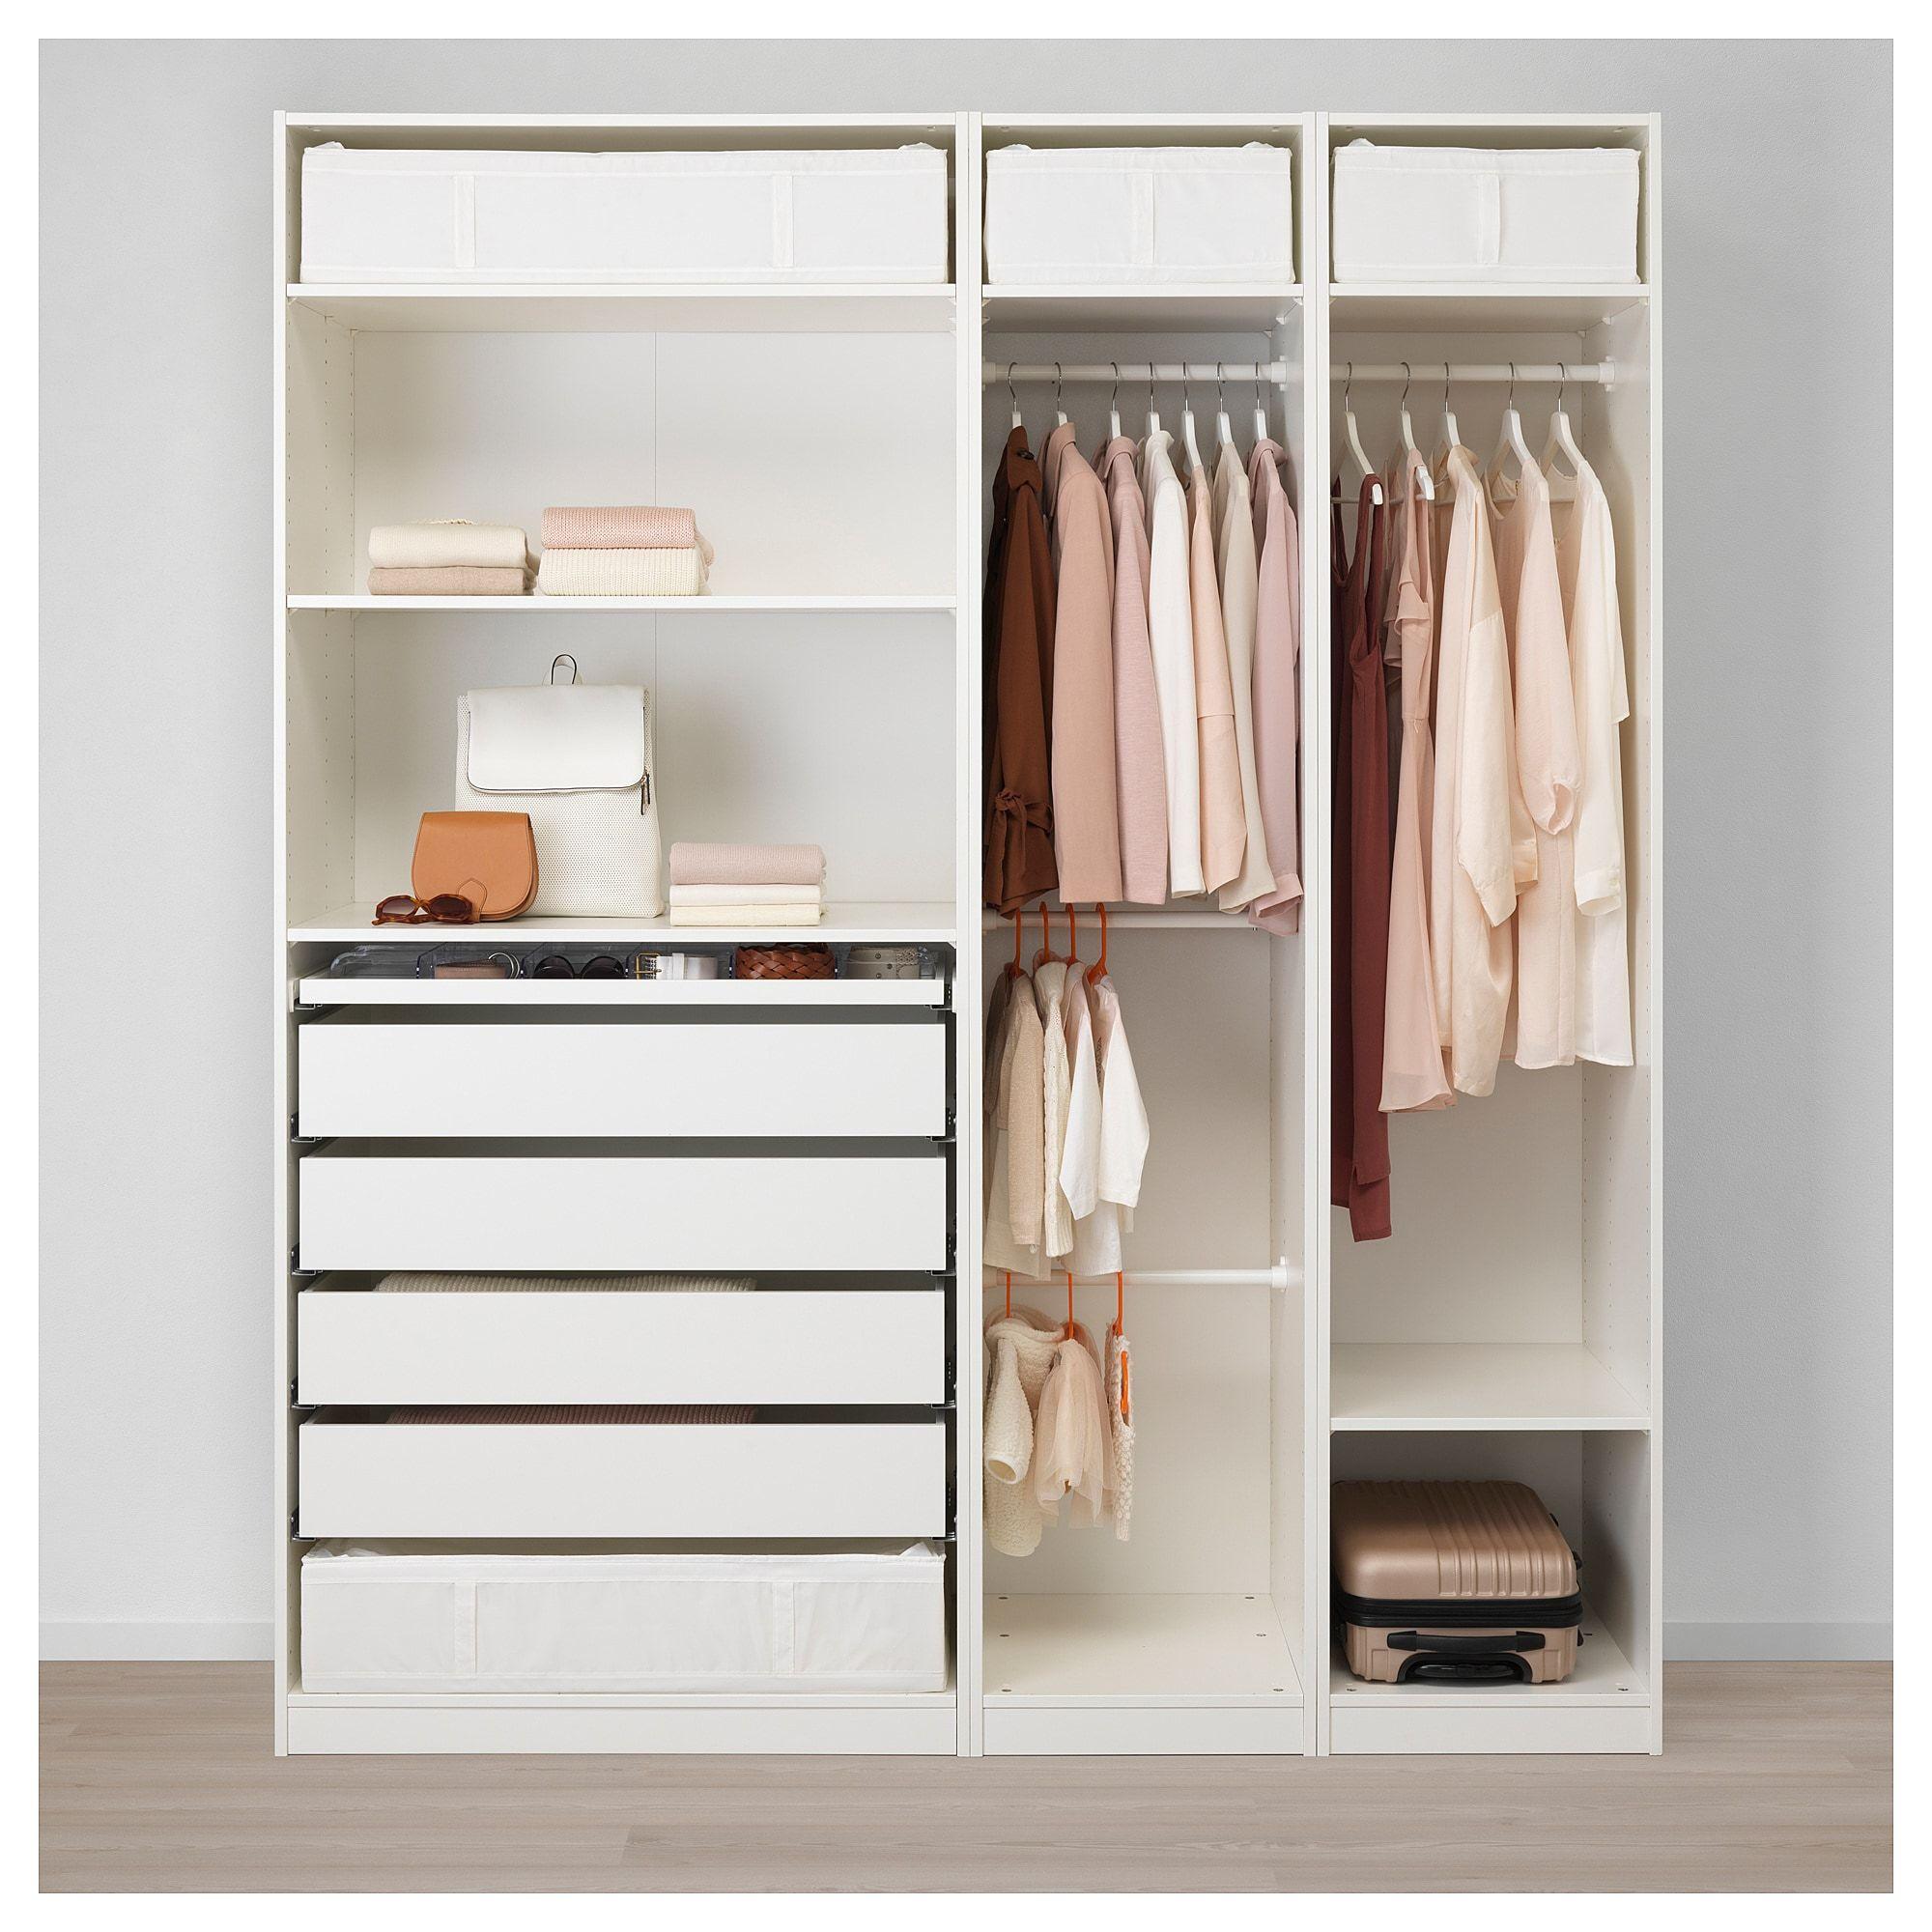 PAX Wardrobe white, Reinsvoll graygreen 78 3/4x23 5